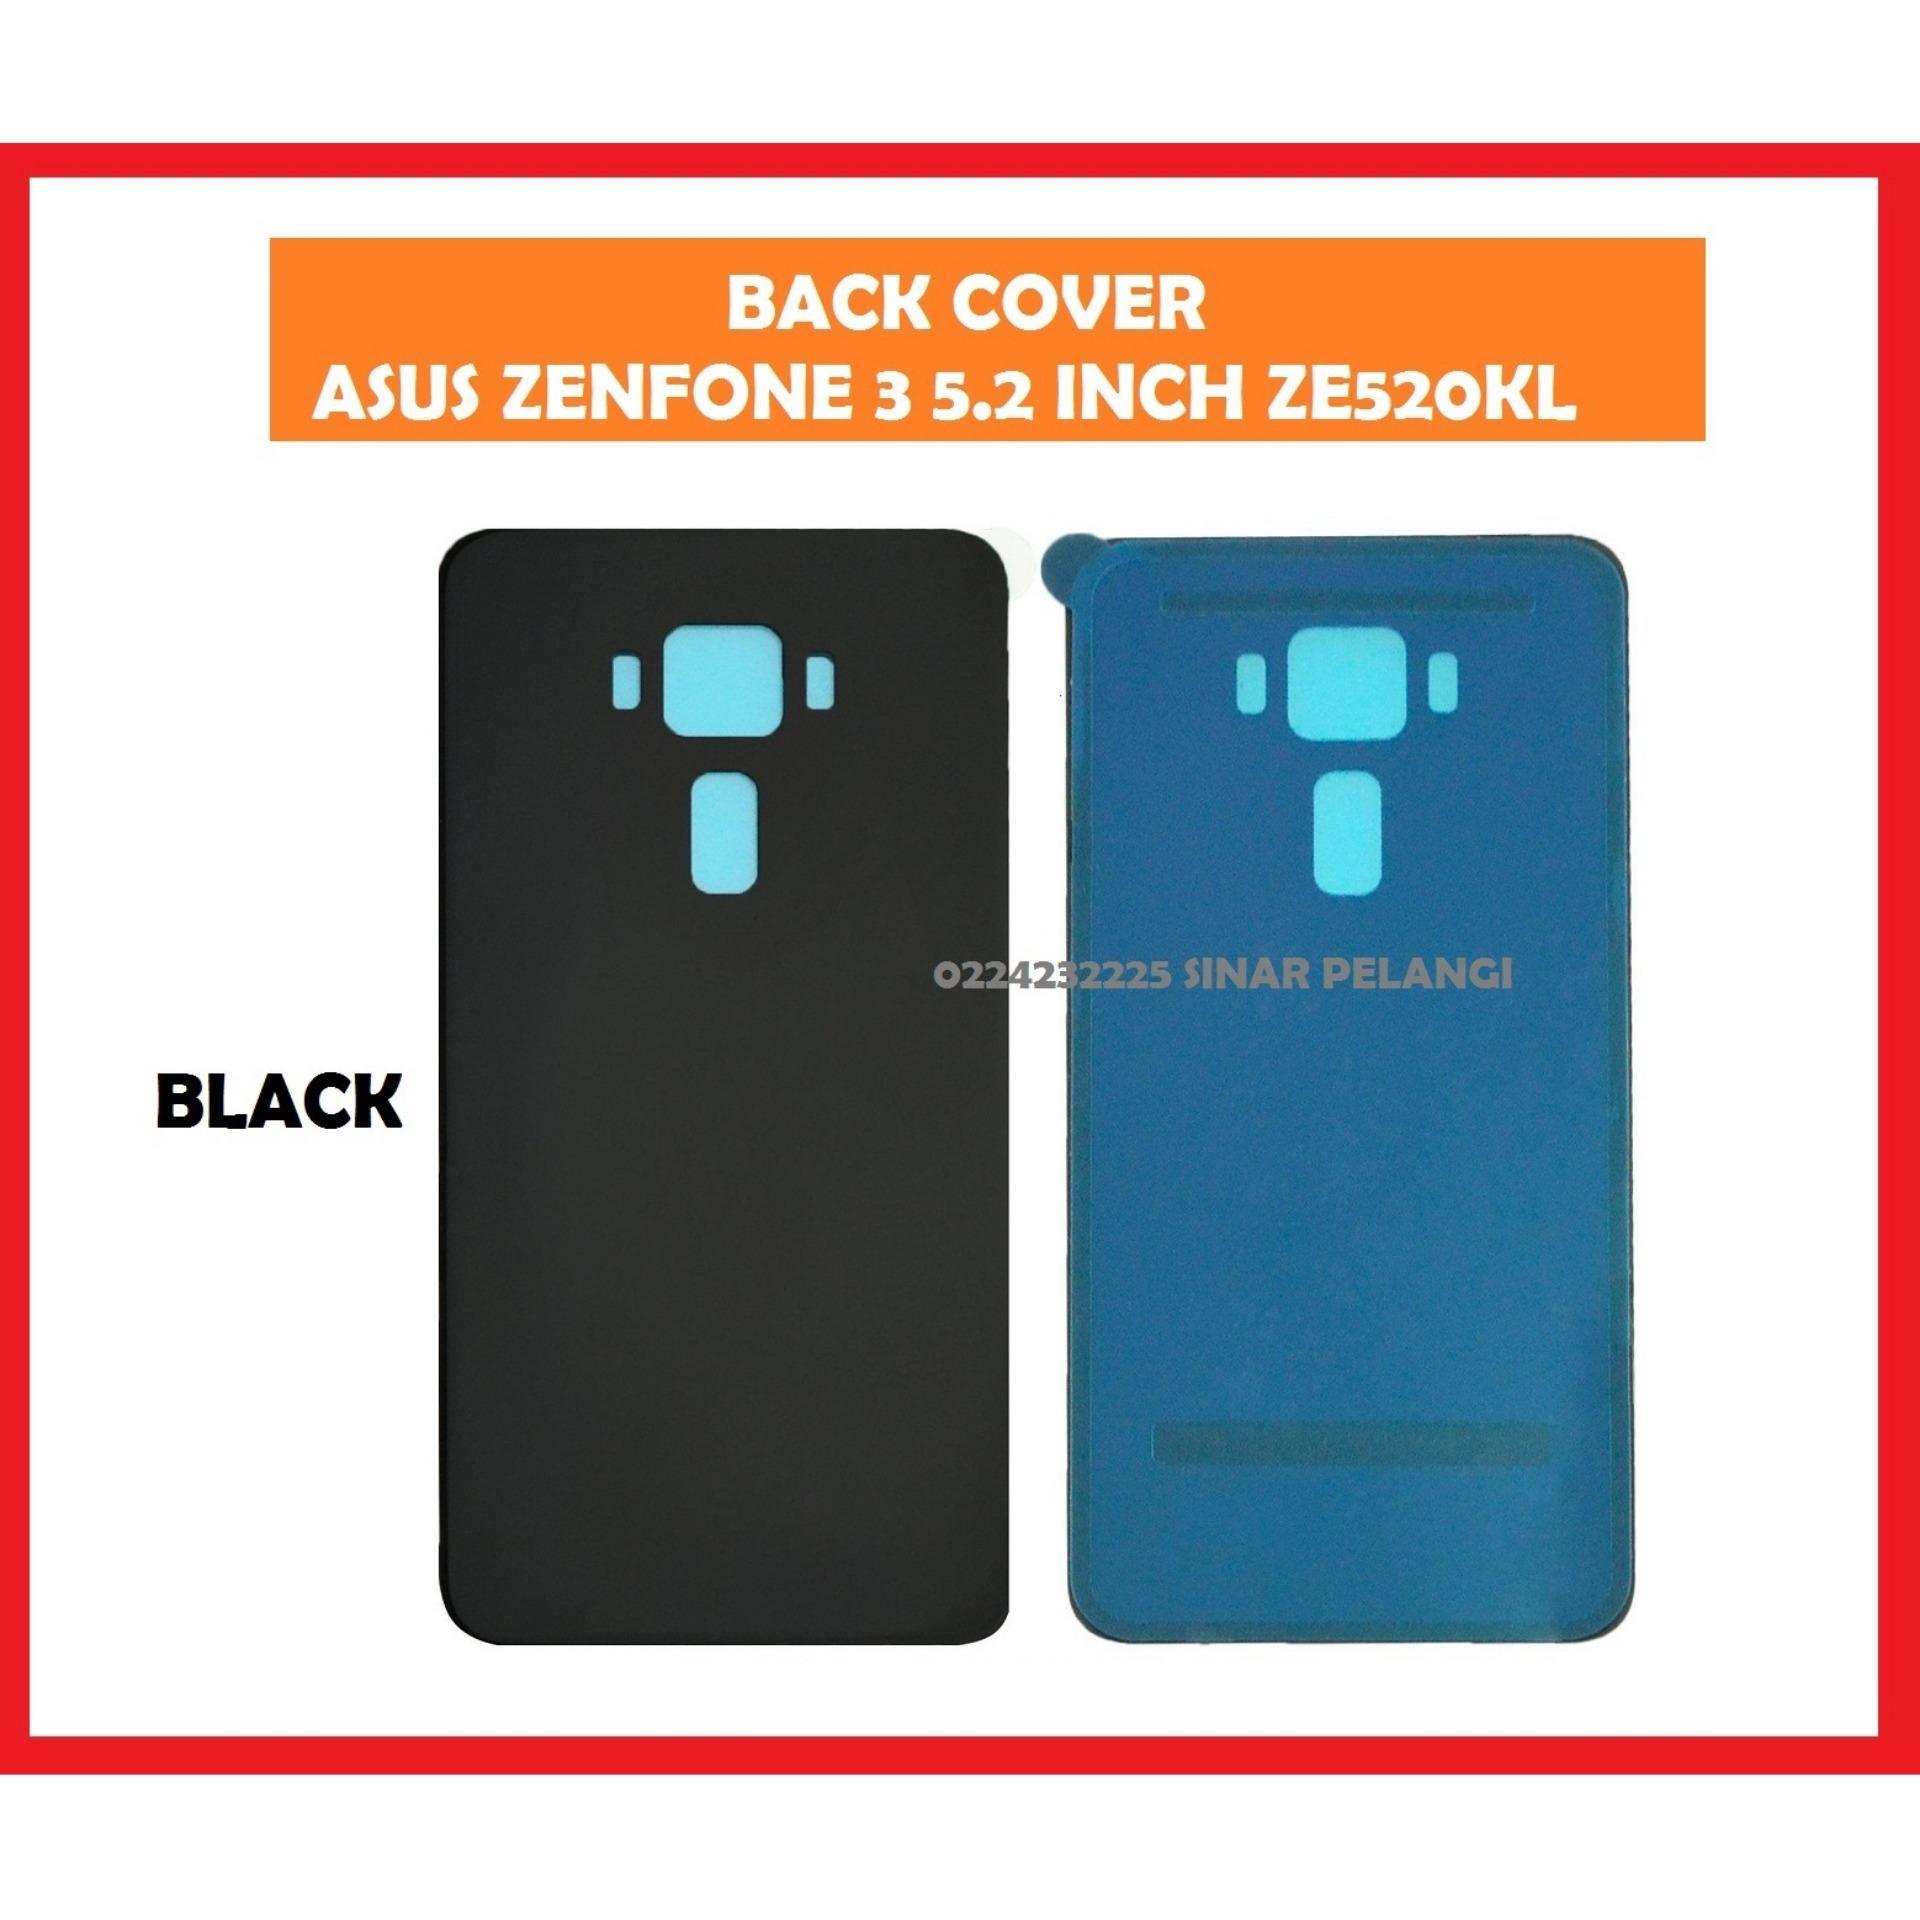 Jual Samsung Galaxy Mega 6 3 I9200 Back Cover Tutup Belakang Sony Z3 Battre Asus Zenfone Ze520kl 52 Inch Z017d Black Battery Door Baterai Casing